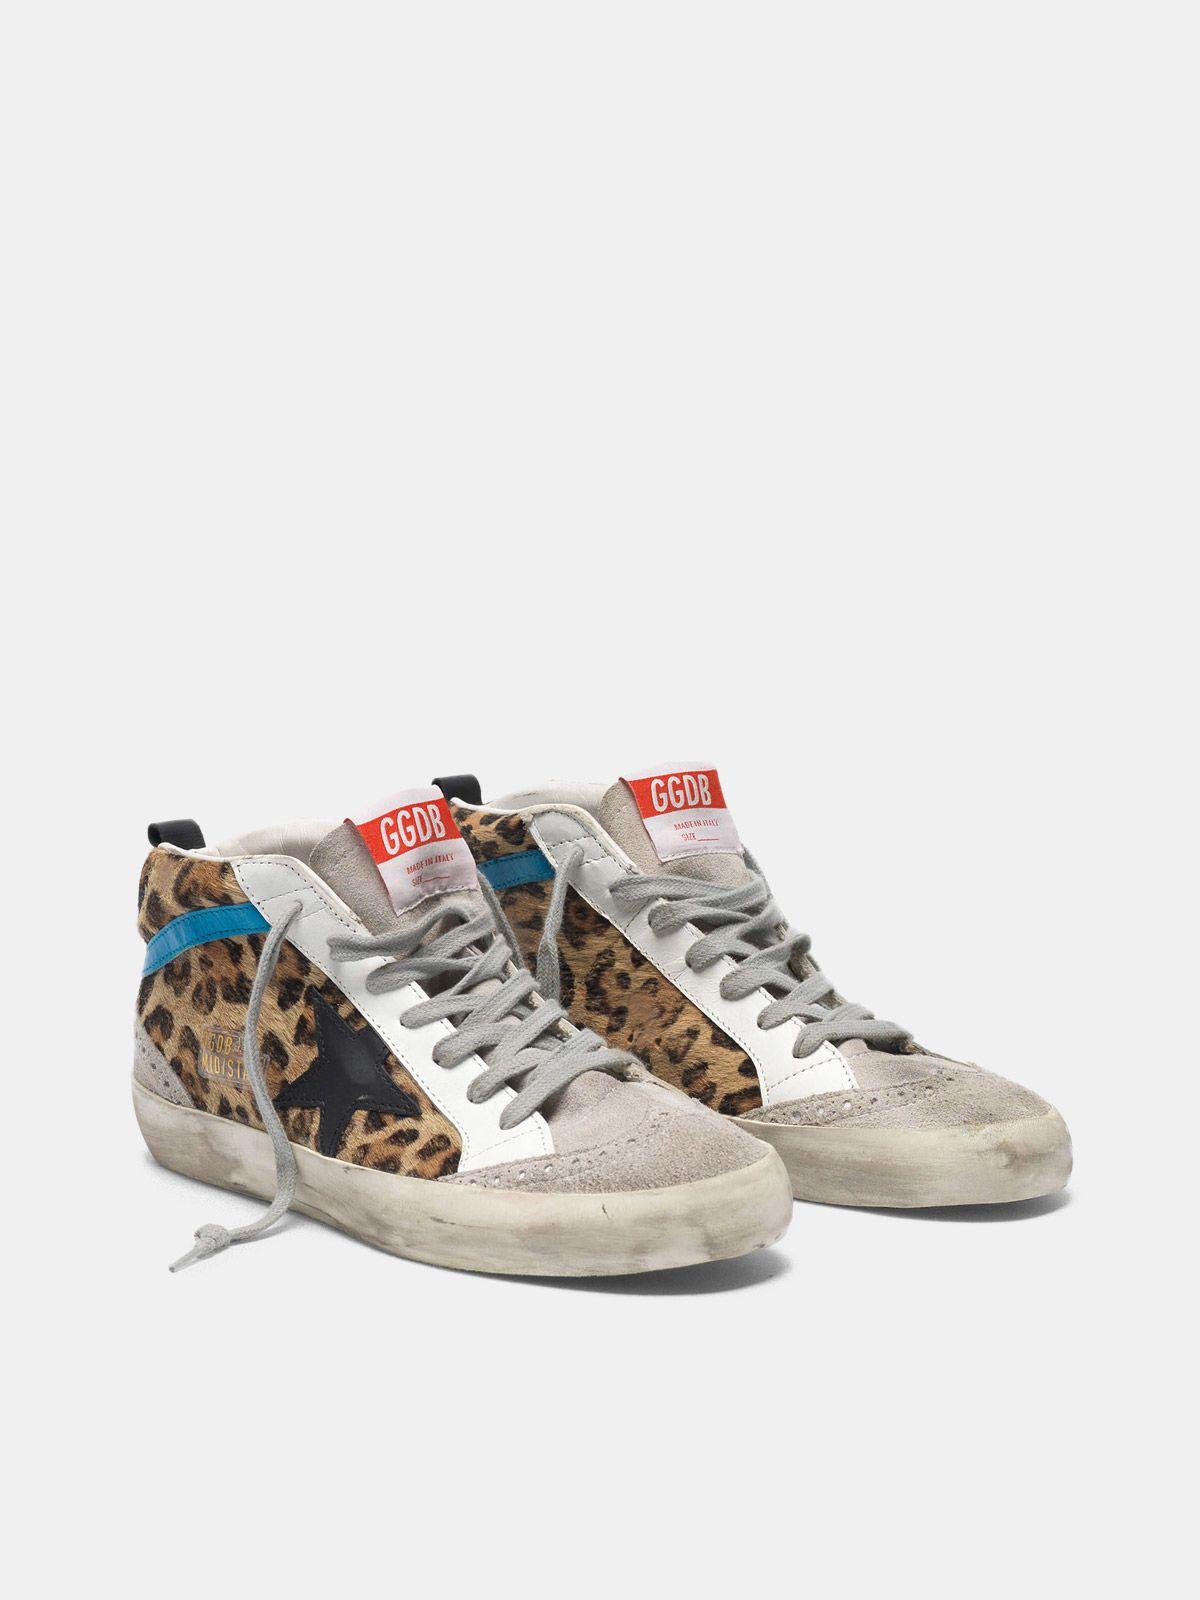 Golden Goose - Mid Star sneakers in leopard print pony skin in